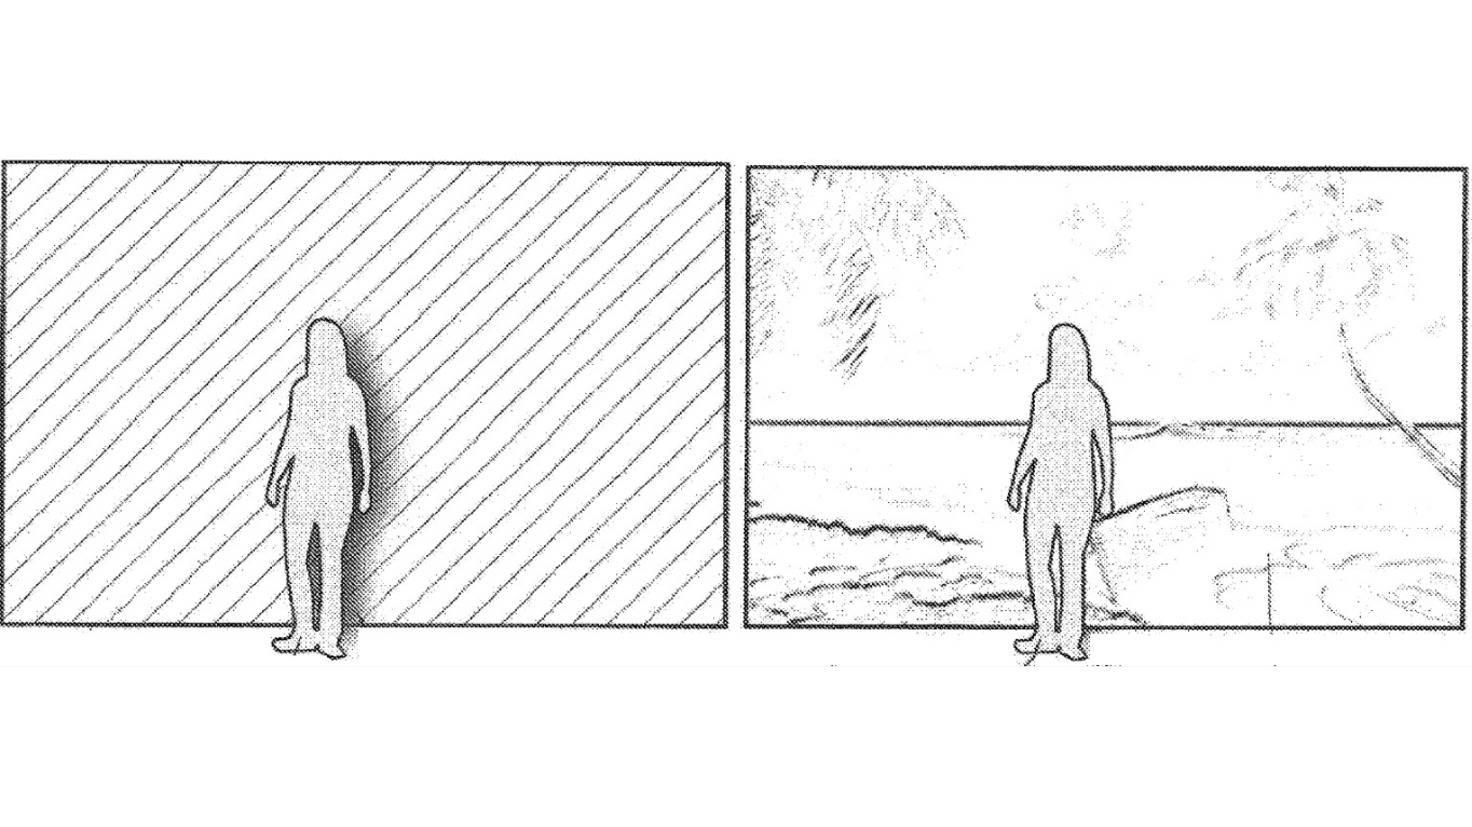 apple-glass-virtuelle-hintergründe-patent